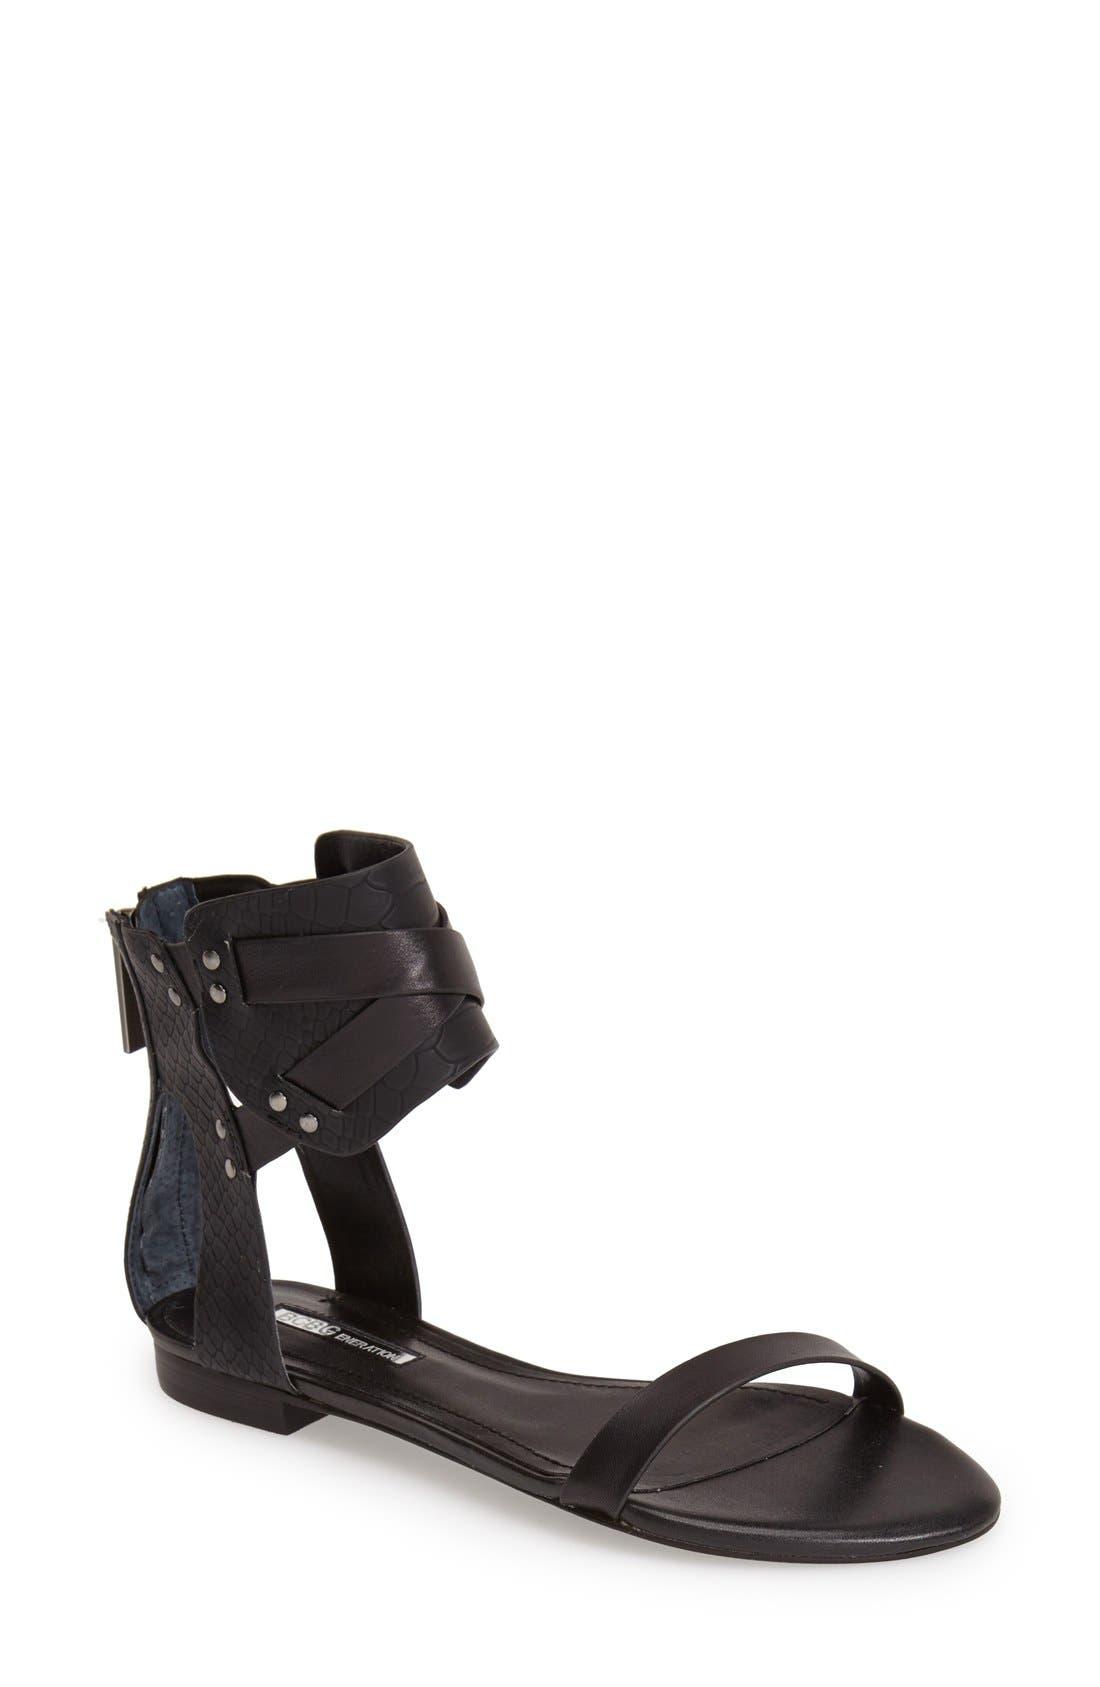 'Braylin' Ankle Cuff Sandal,                         Main,                         color, 001